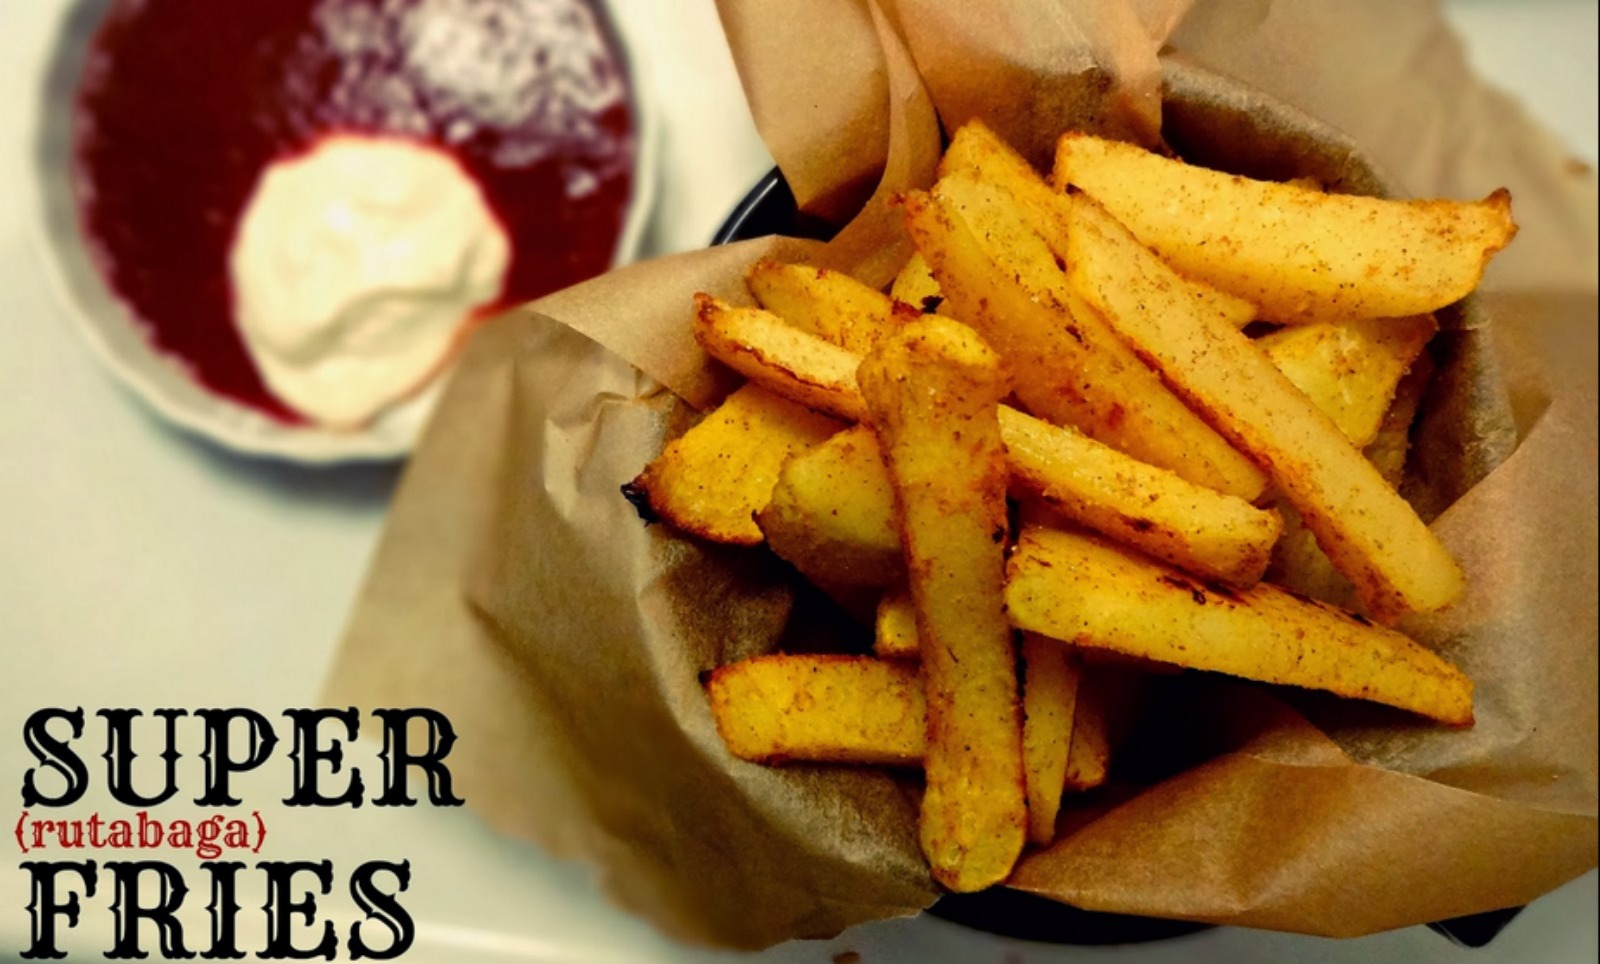 Danielle's Super (Rutabaga) Fries!